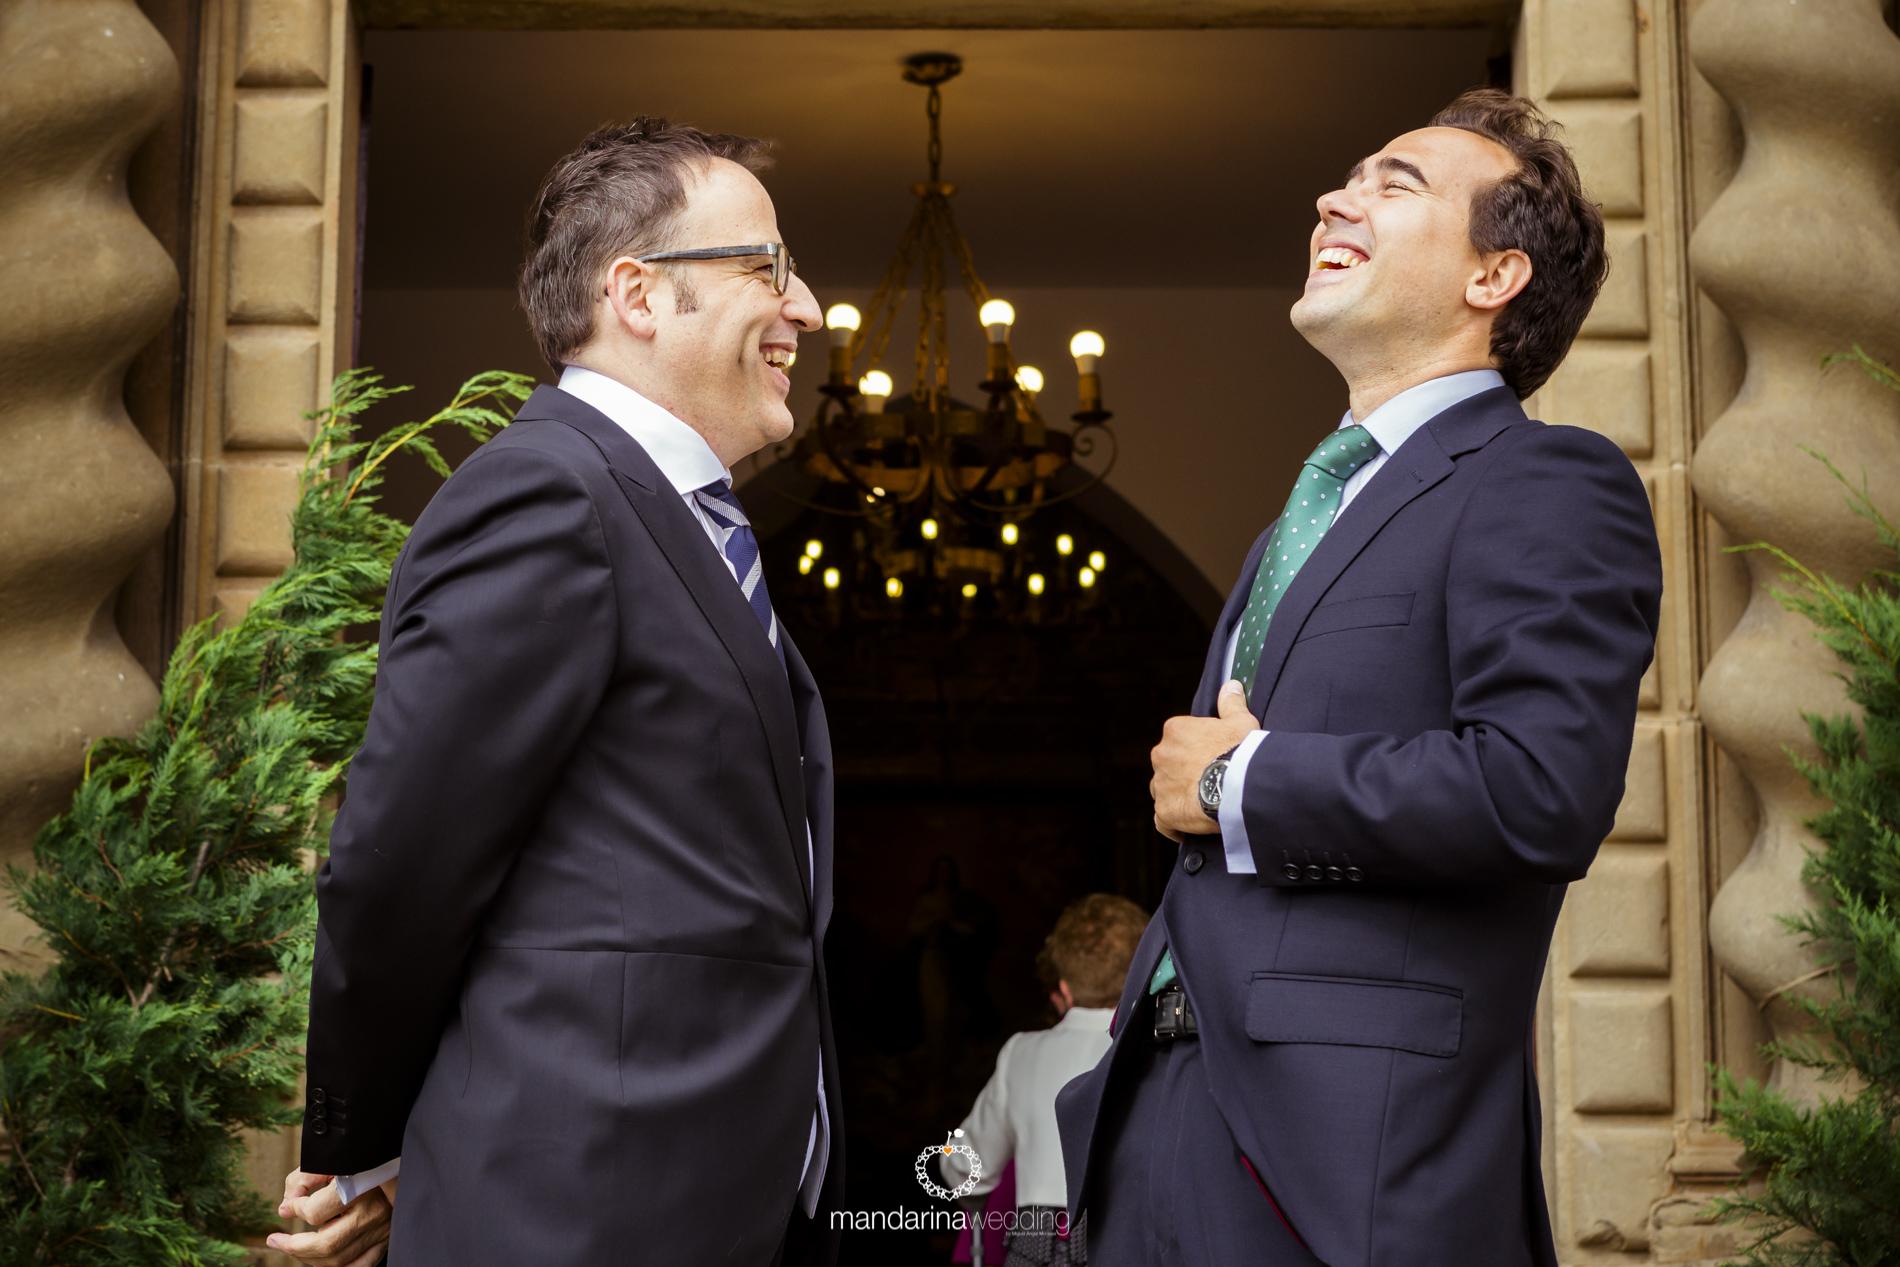 mandaria wedding, fotografos de boda, fotoperiodismo de boda, mejores fotografos de boda, bodas soria, bodas pirineo, bodas Madrid, fotógrafos tarragona_15